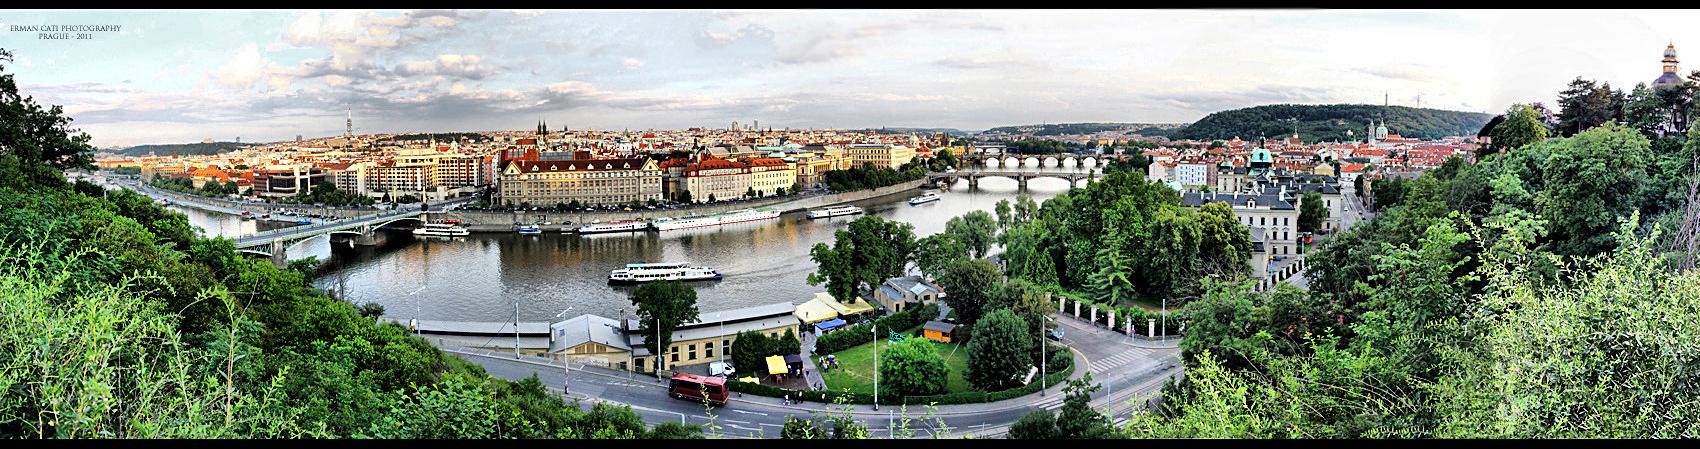 Prague Panorama - I by rushofdeath